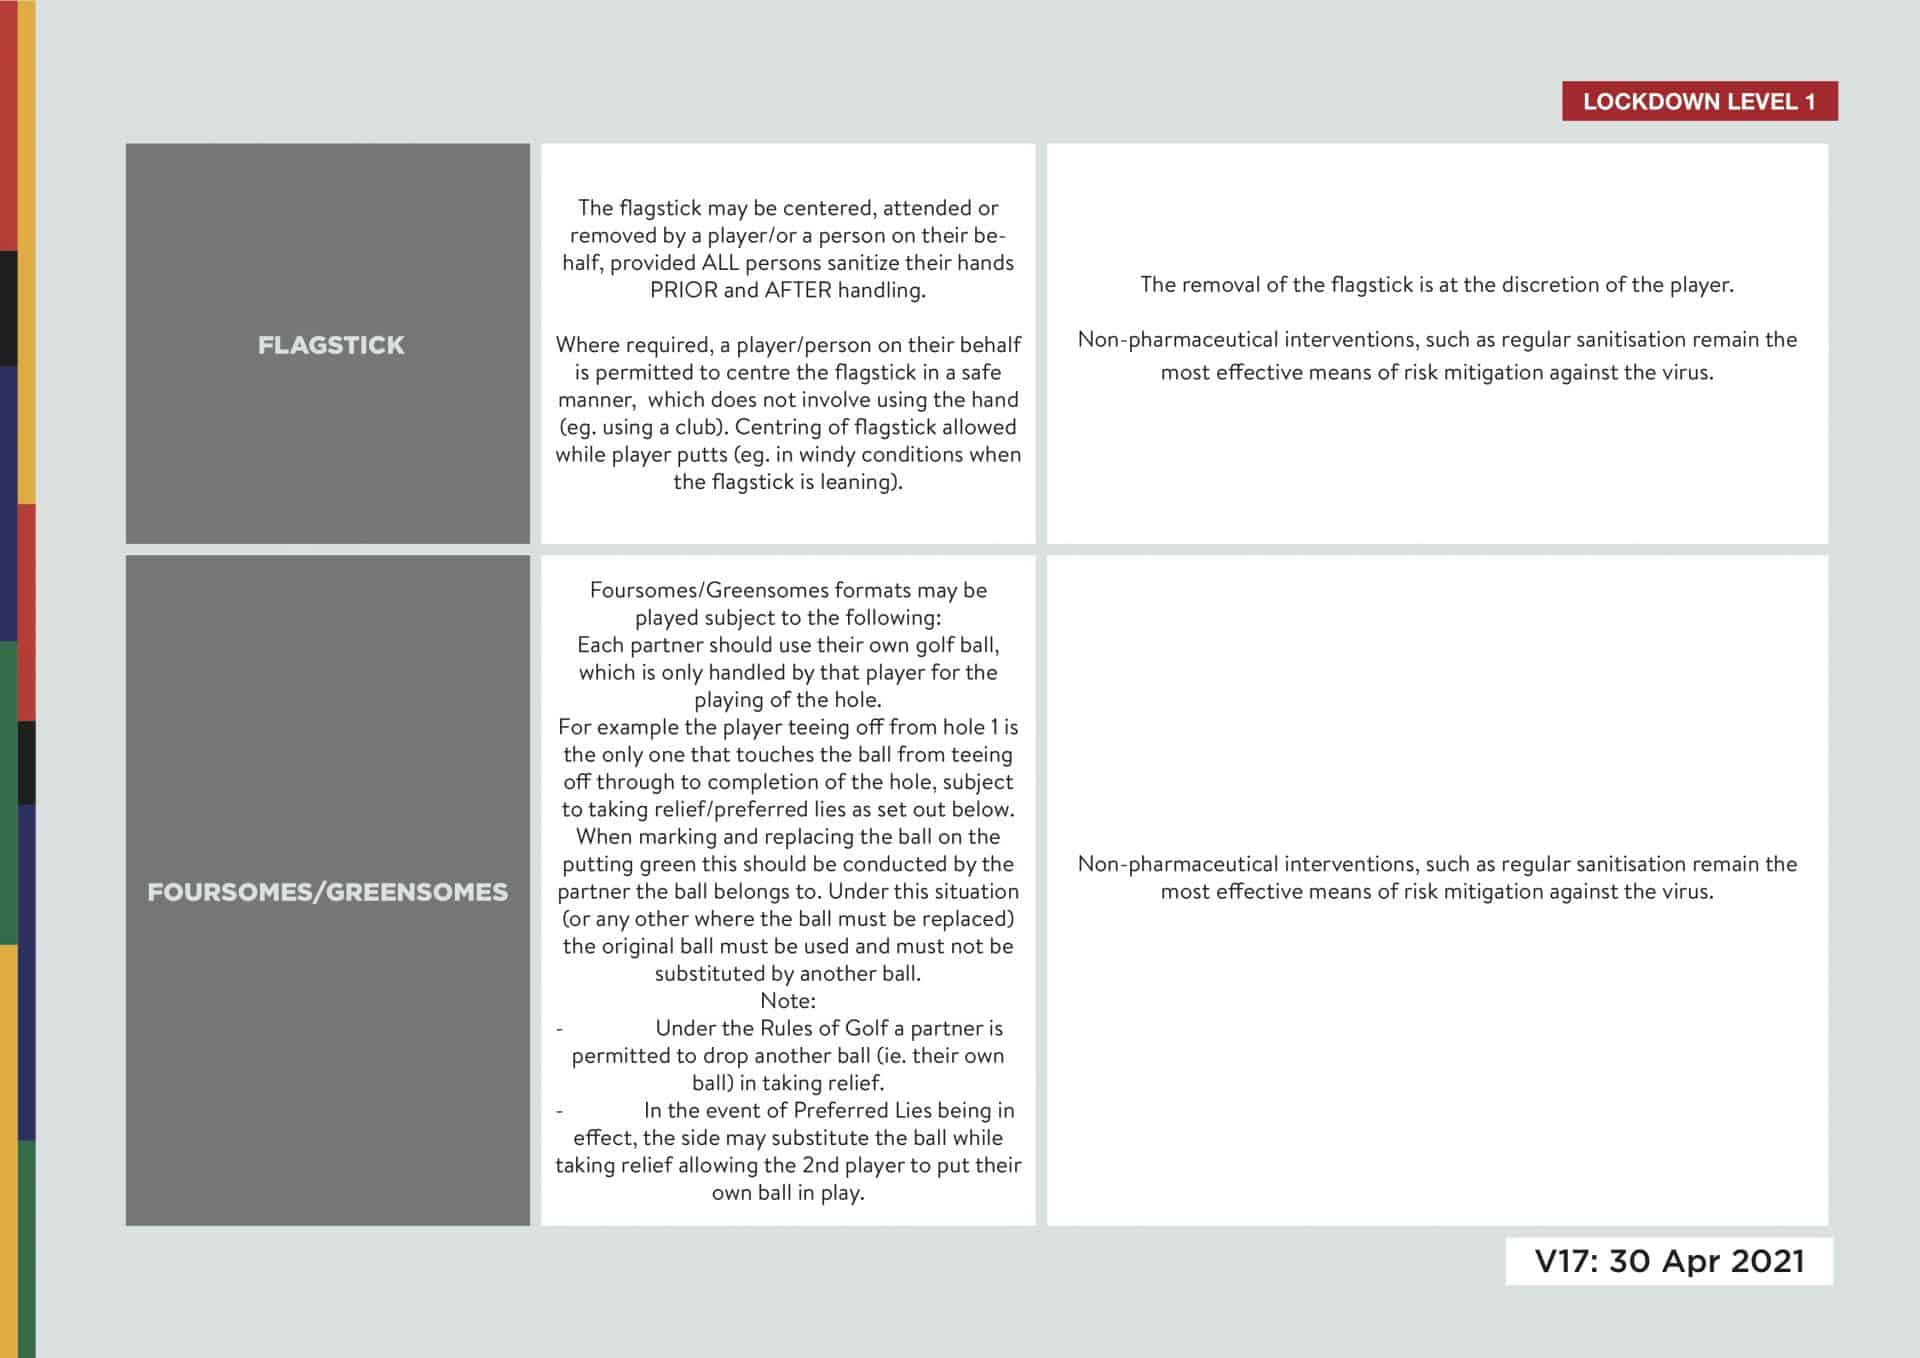 3 - Consolidated Risk Mitigation Guidelines V17